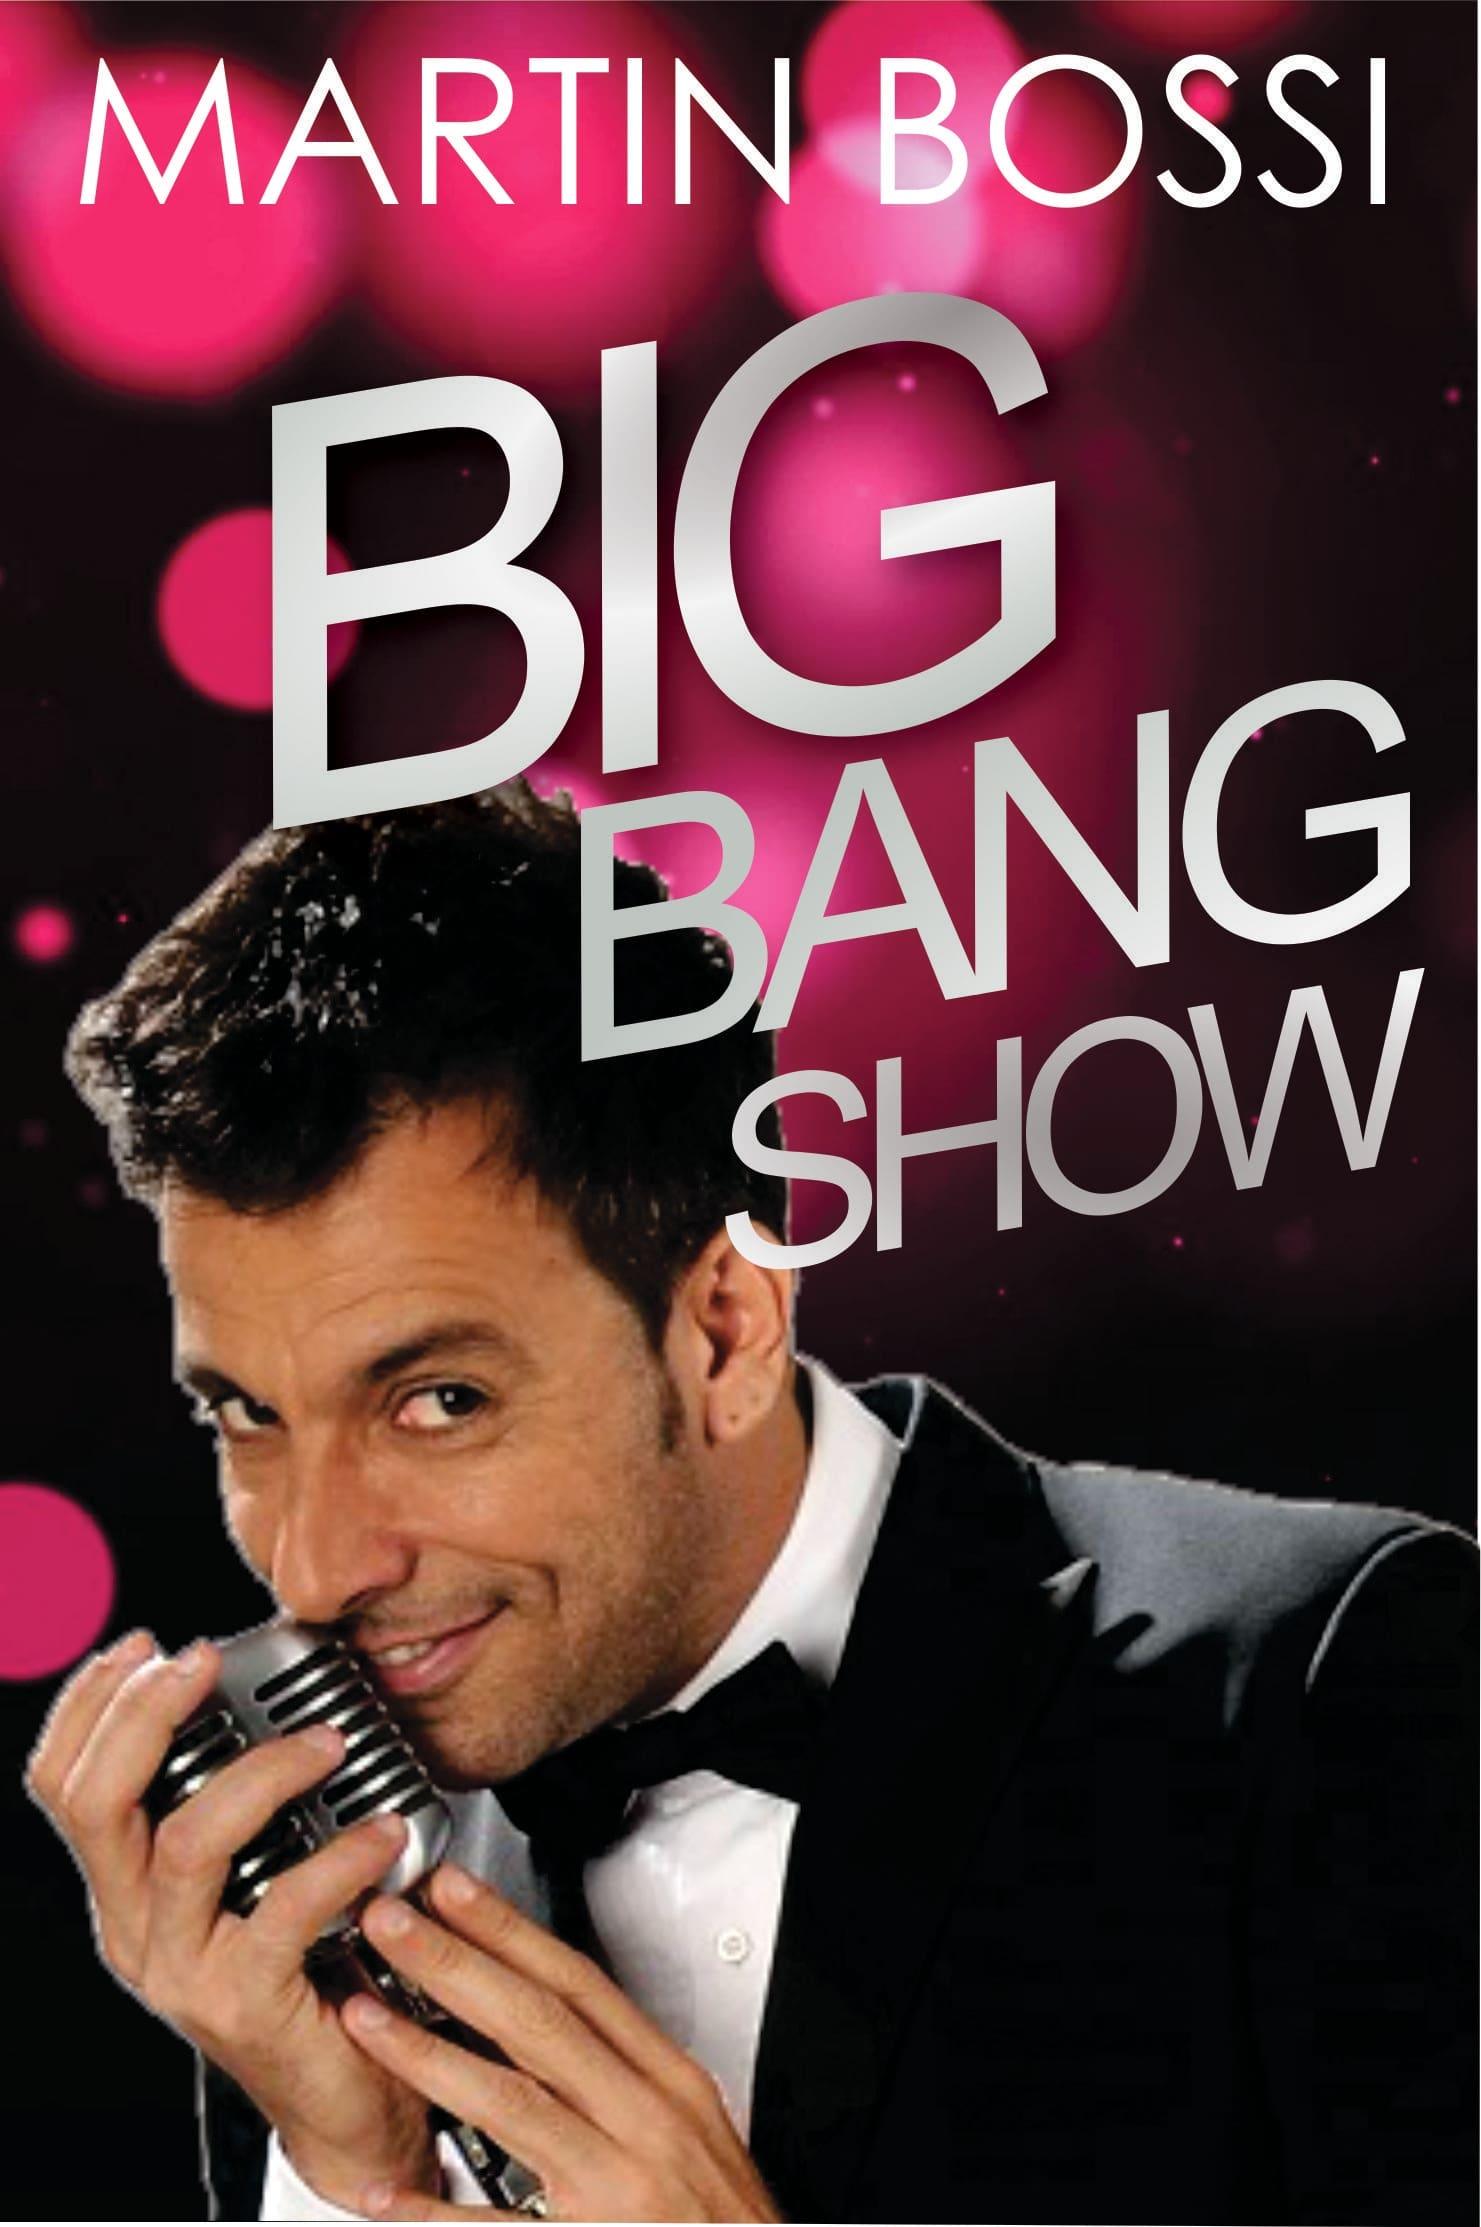 BIG BANG SHOW (2014)